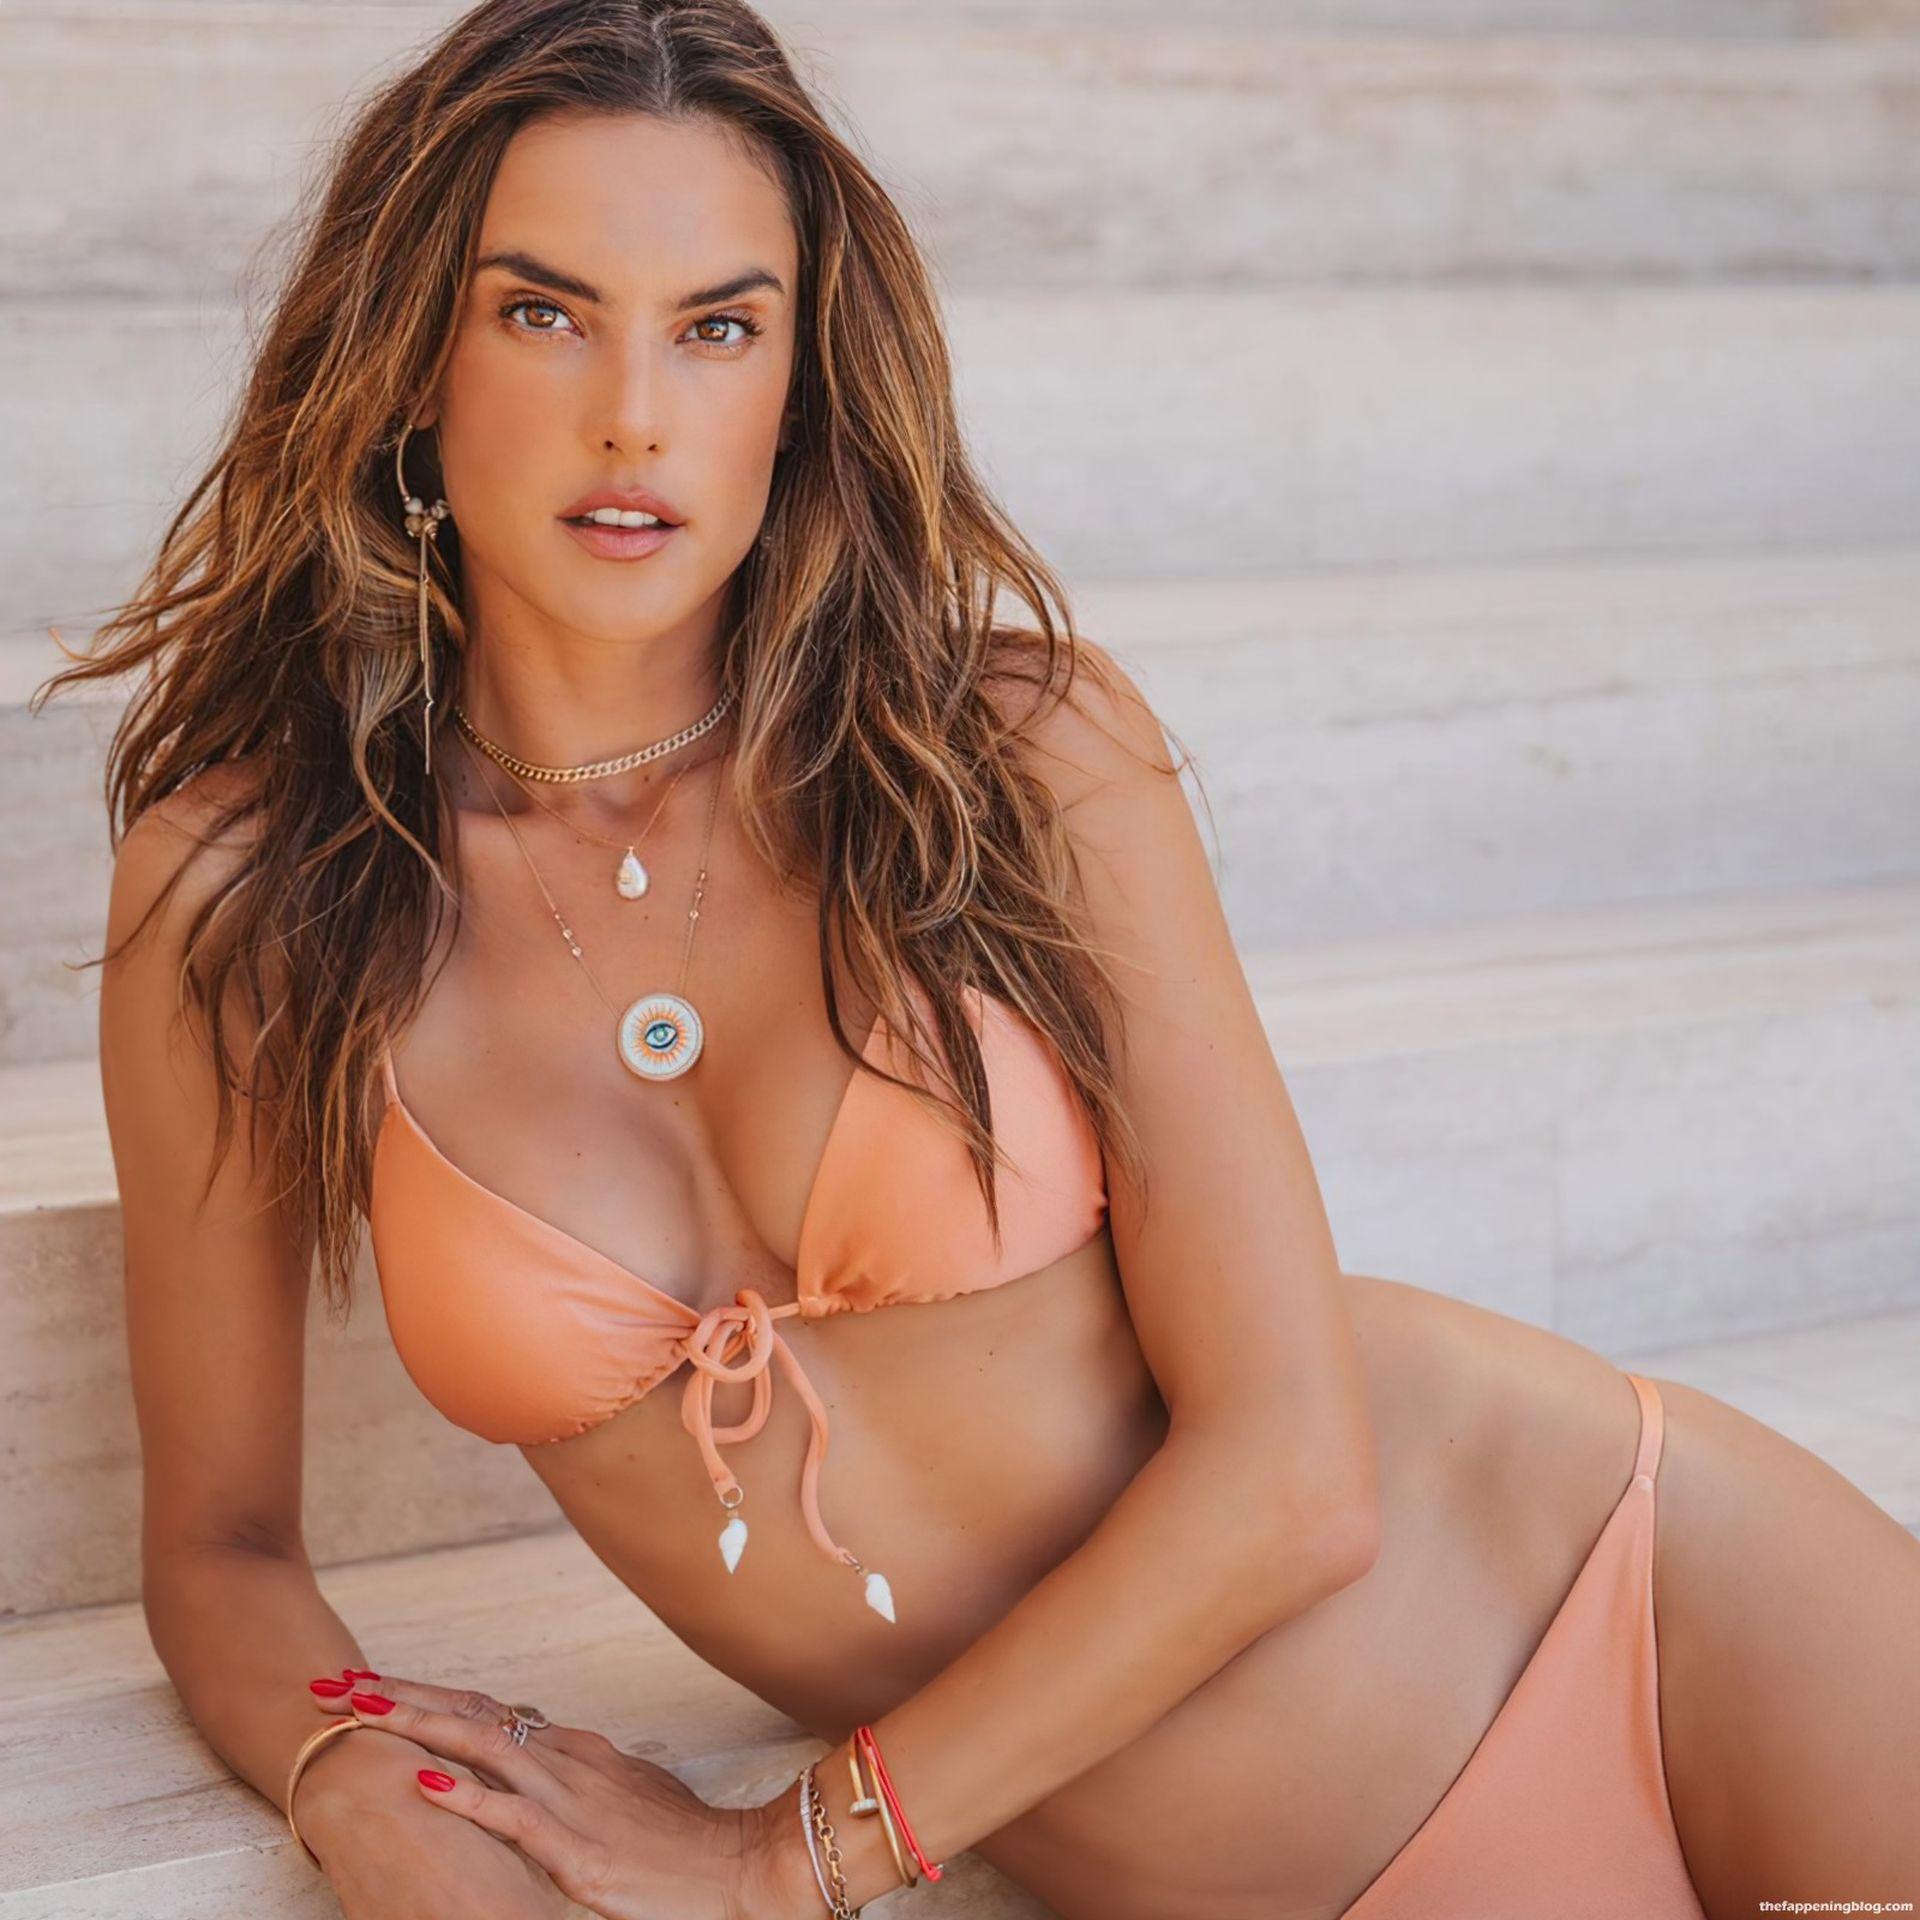 Alessandra-Ambrosio-Sexy-Bikinis-6-thefappeningblog.com_.jpg